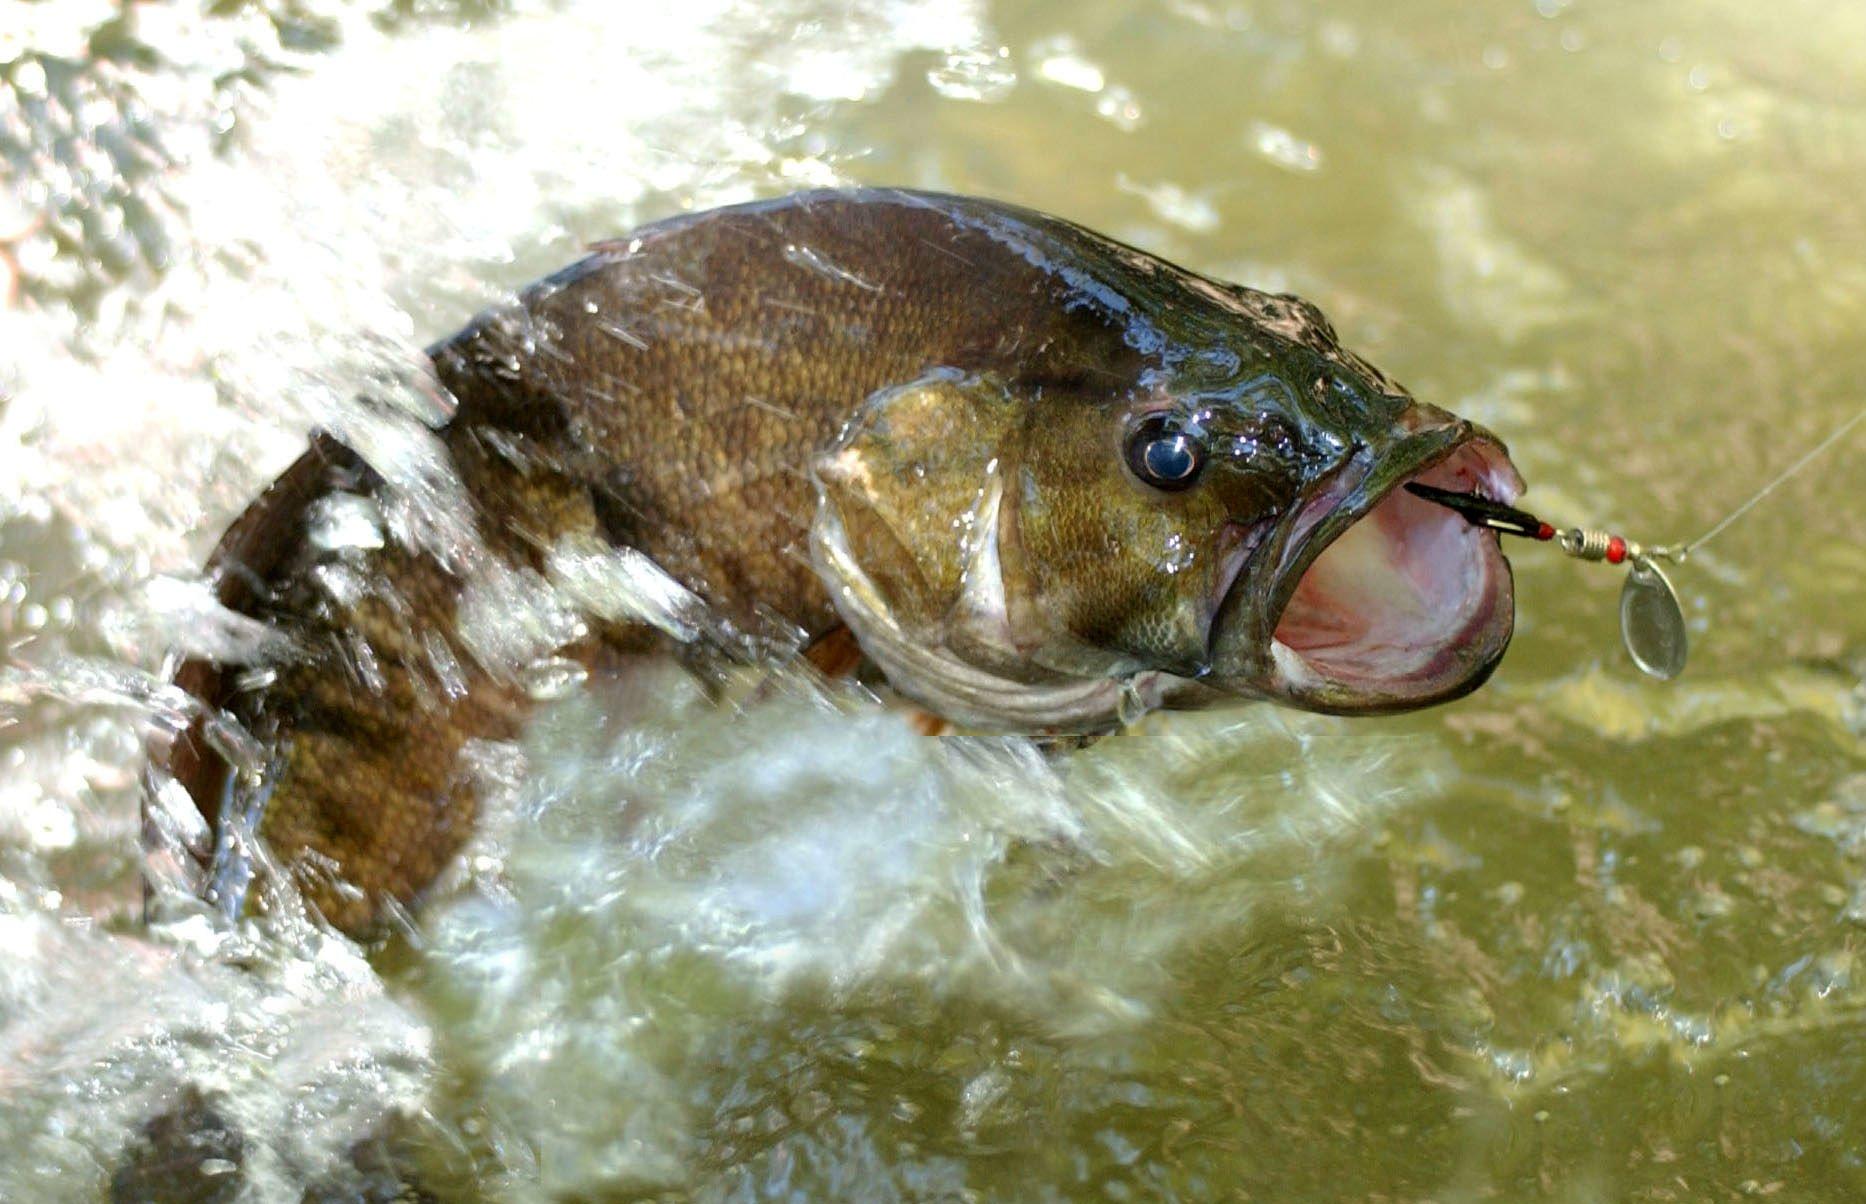 FISHING fish sport fishes bass battle wallpaper 1866x1204 324648 1866x1204